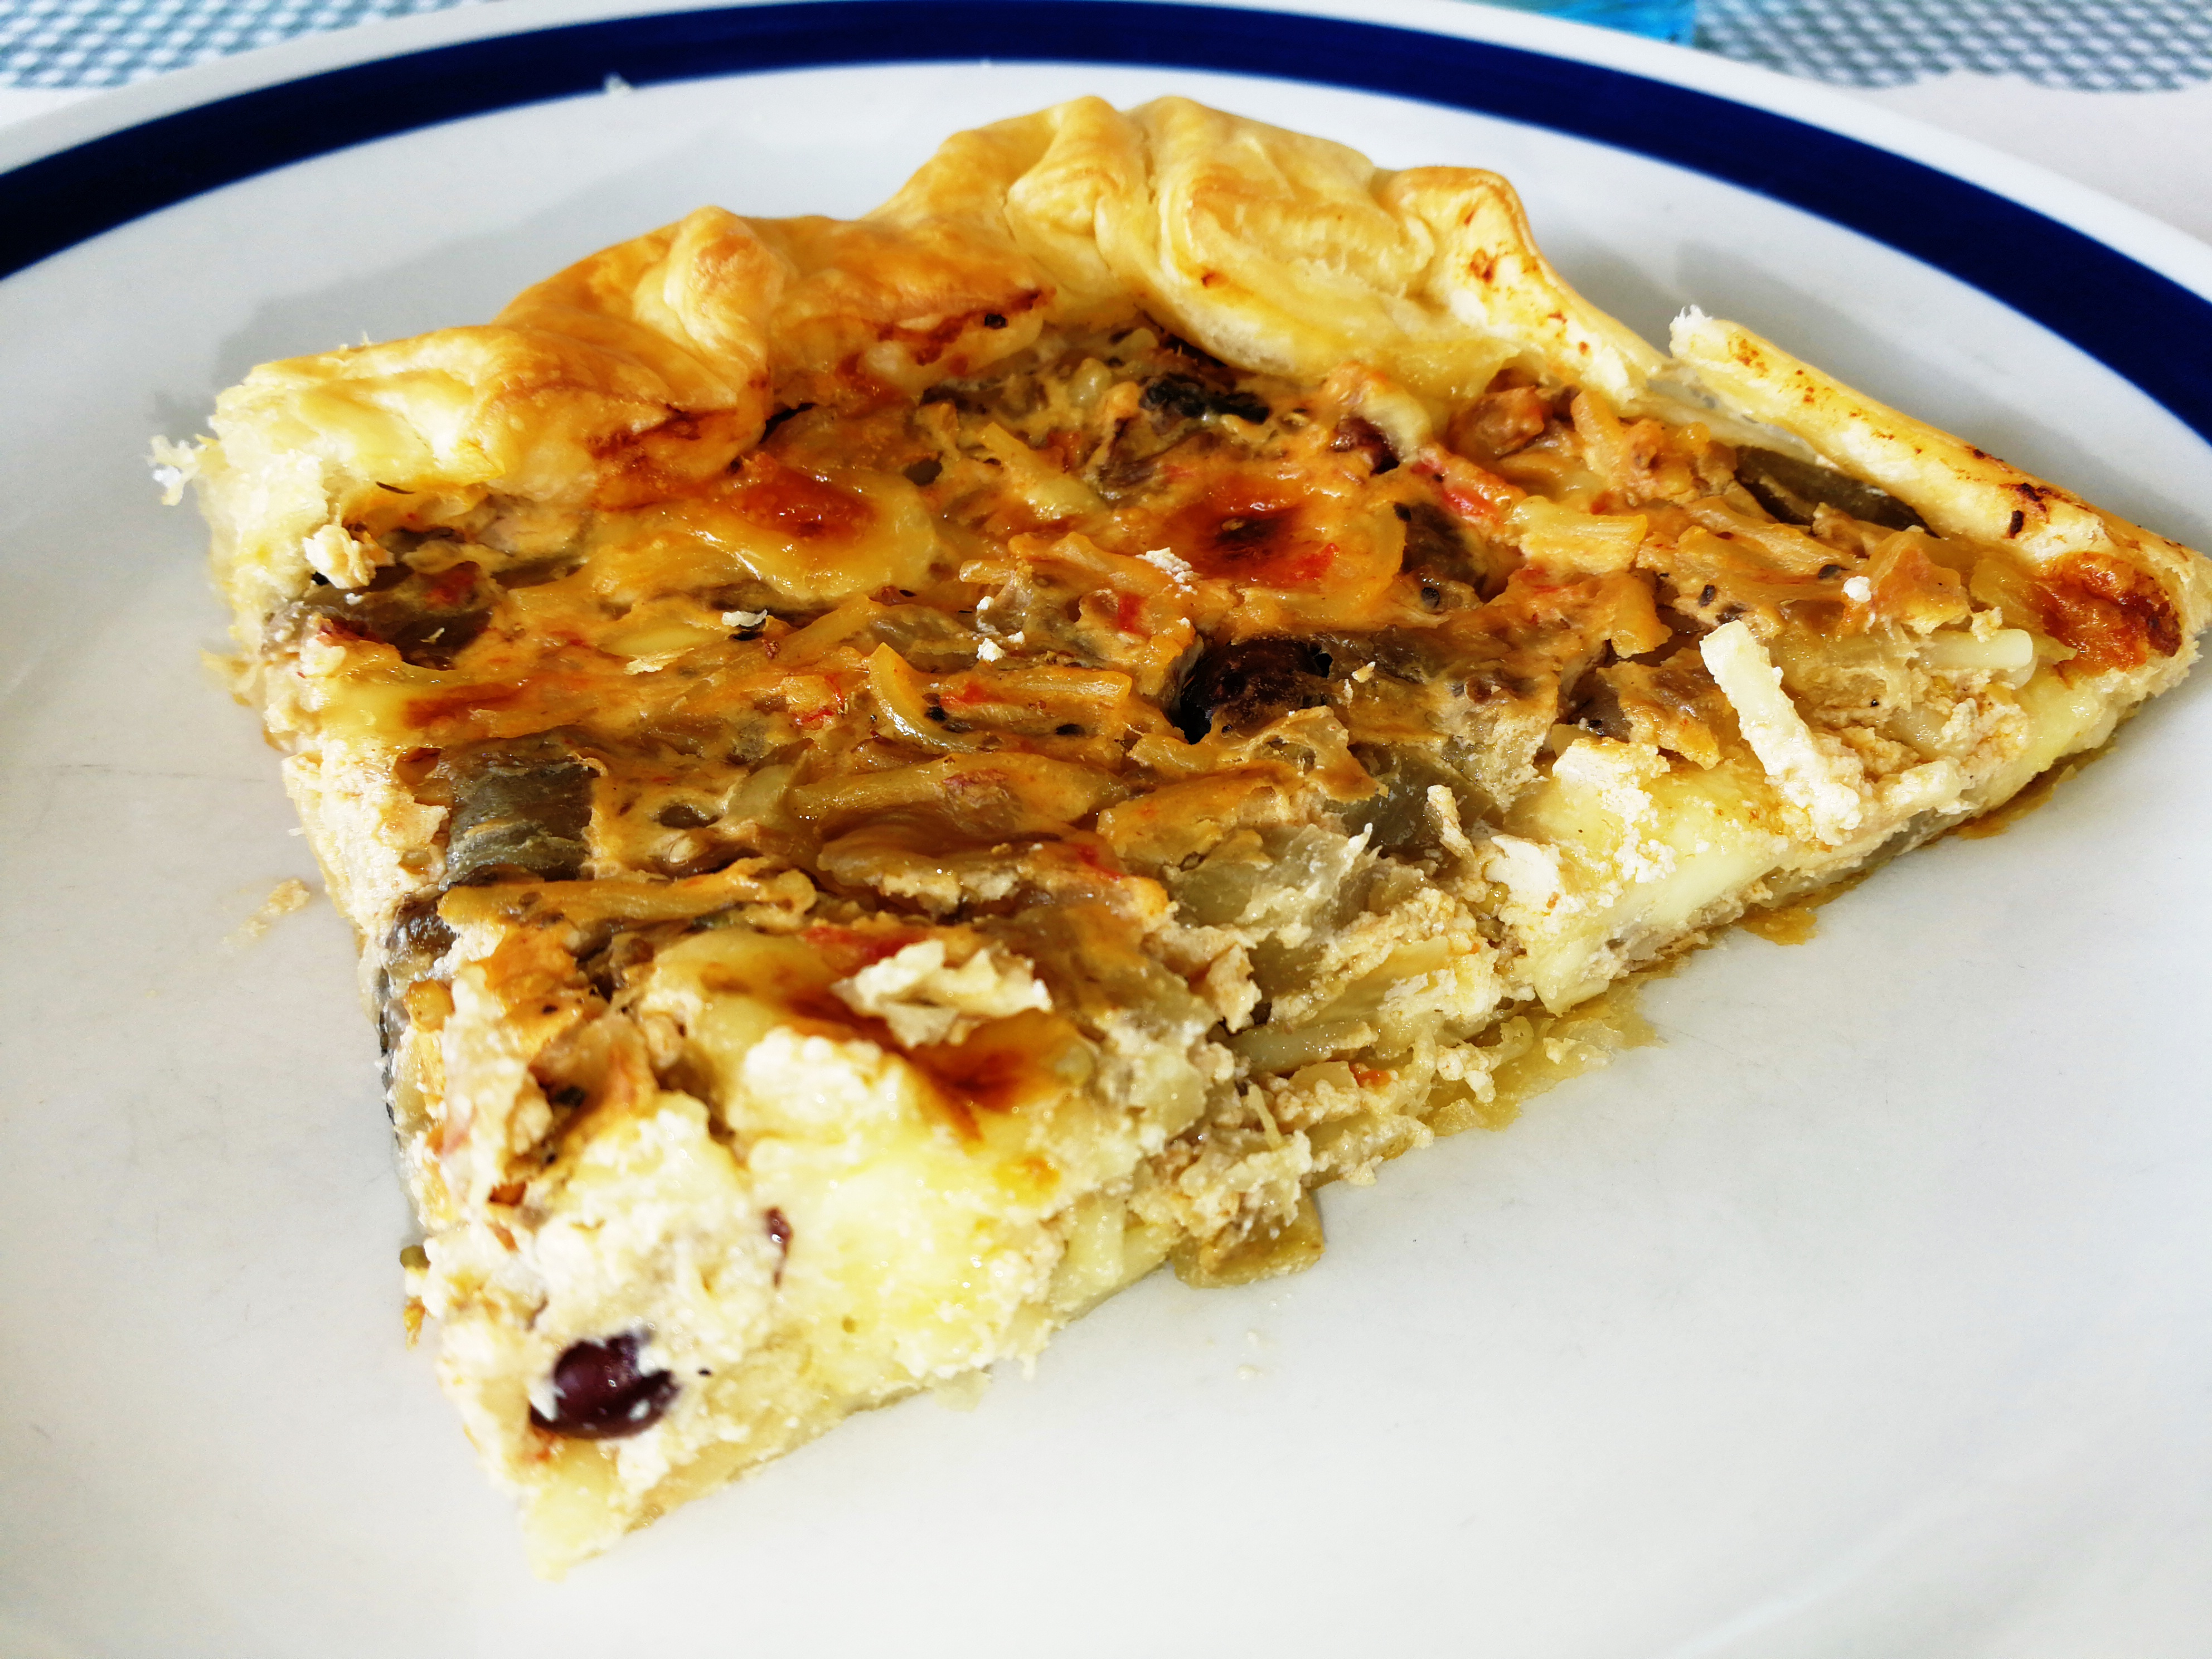 Svuotafrigo - torta salata dal Friuli alla Sicilia